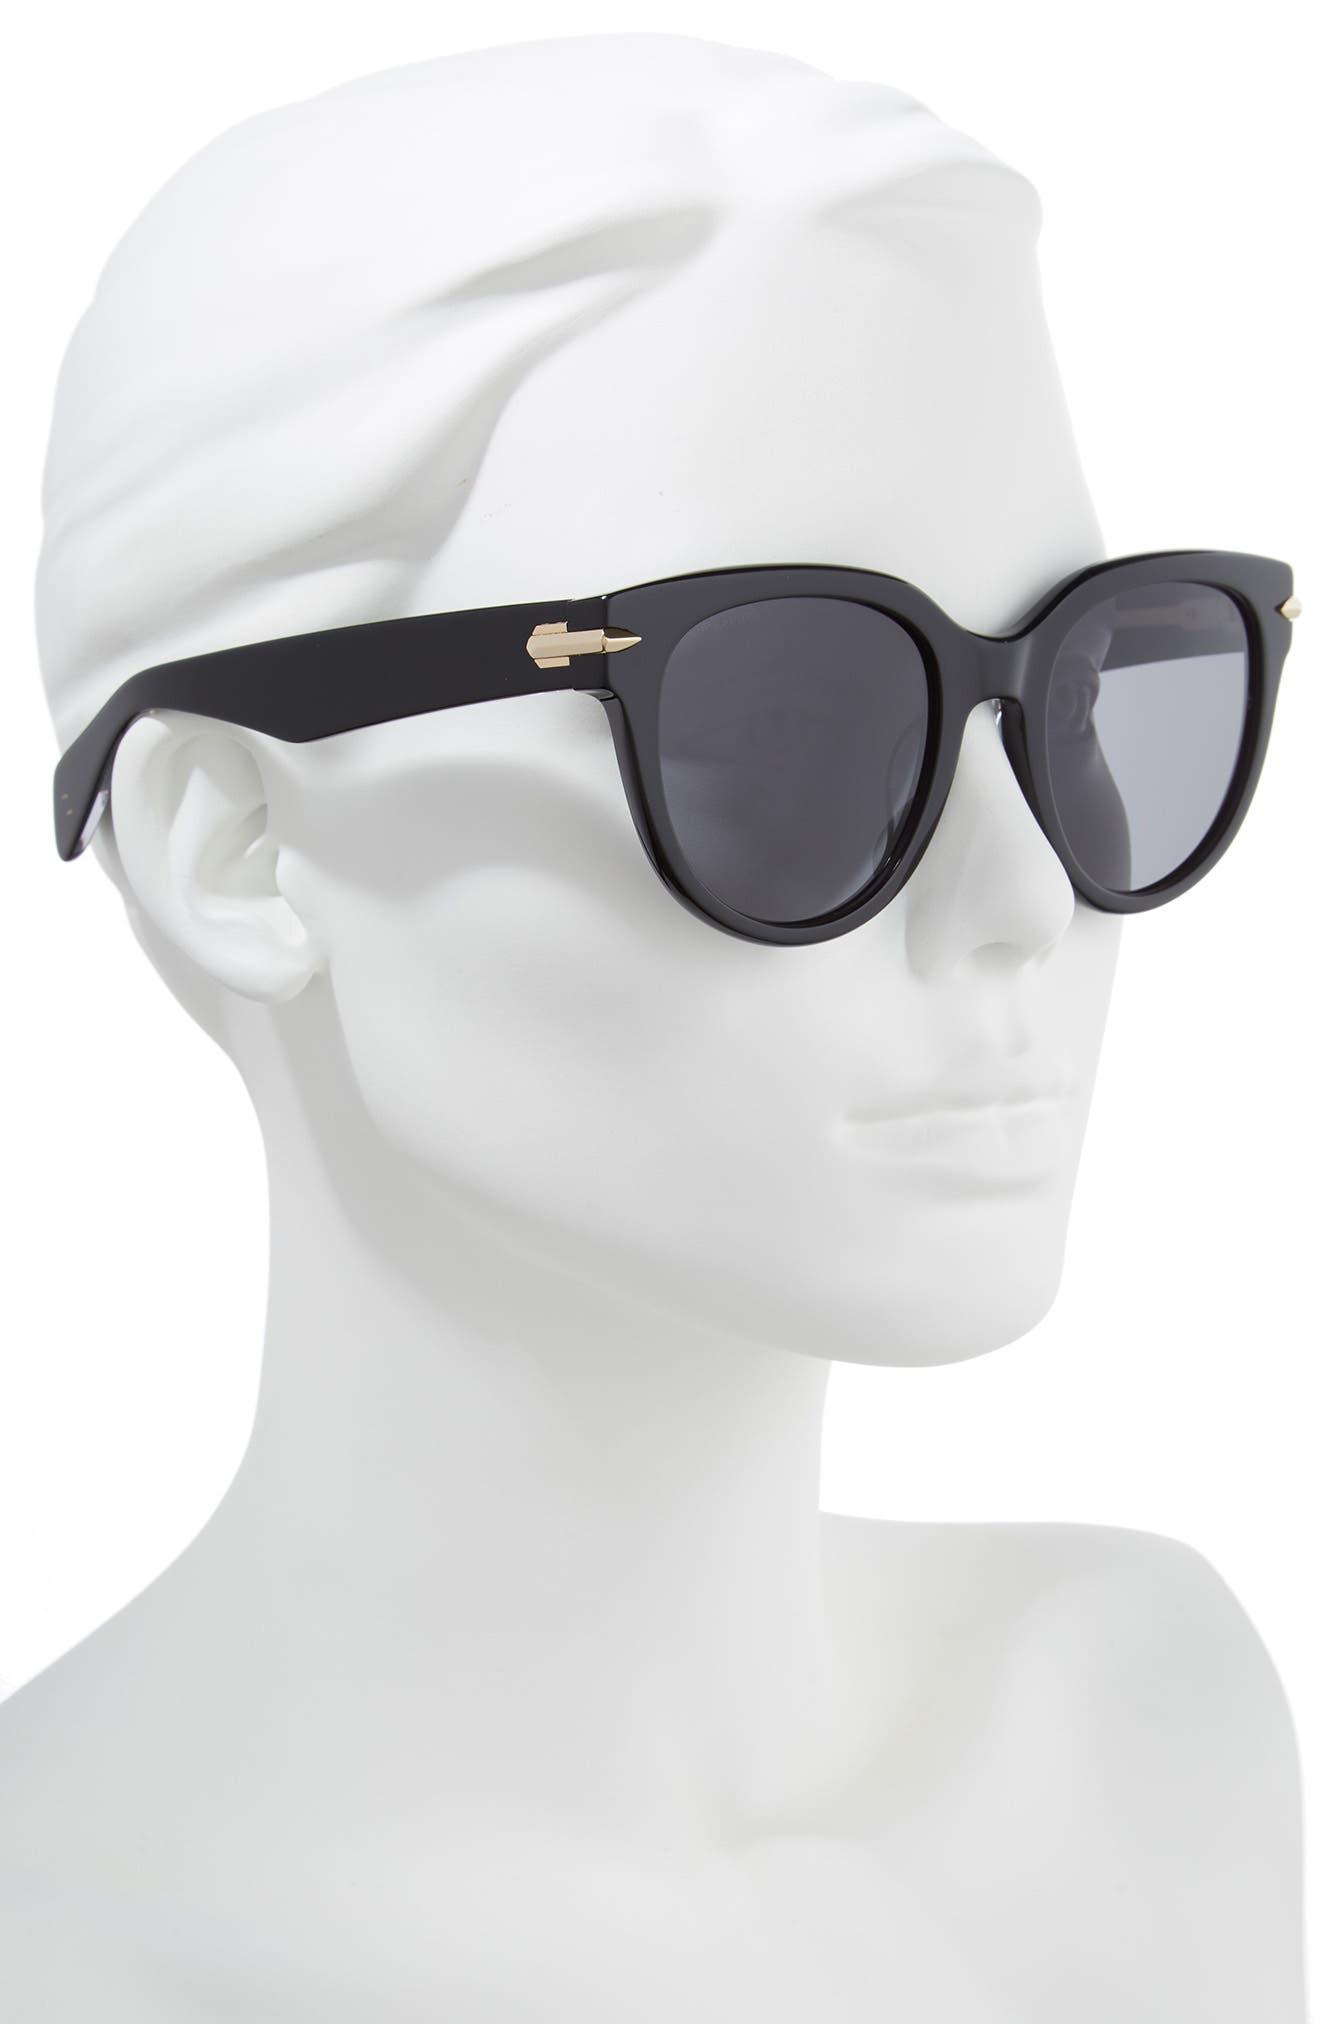 54mm Round Sunglasses,                             Alternate thumbnail 2, color,                             BLACK/ CRYSTAL